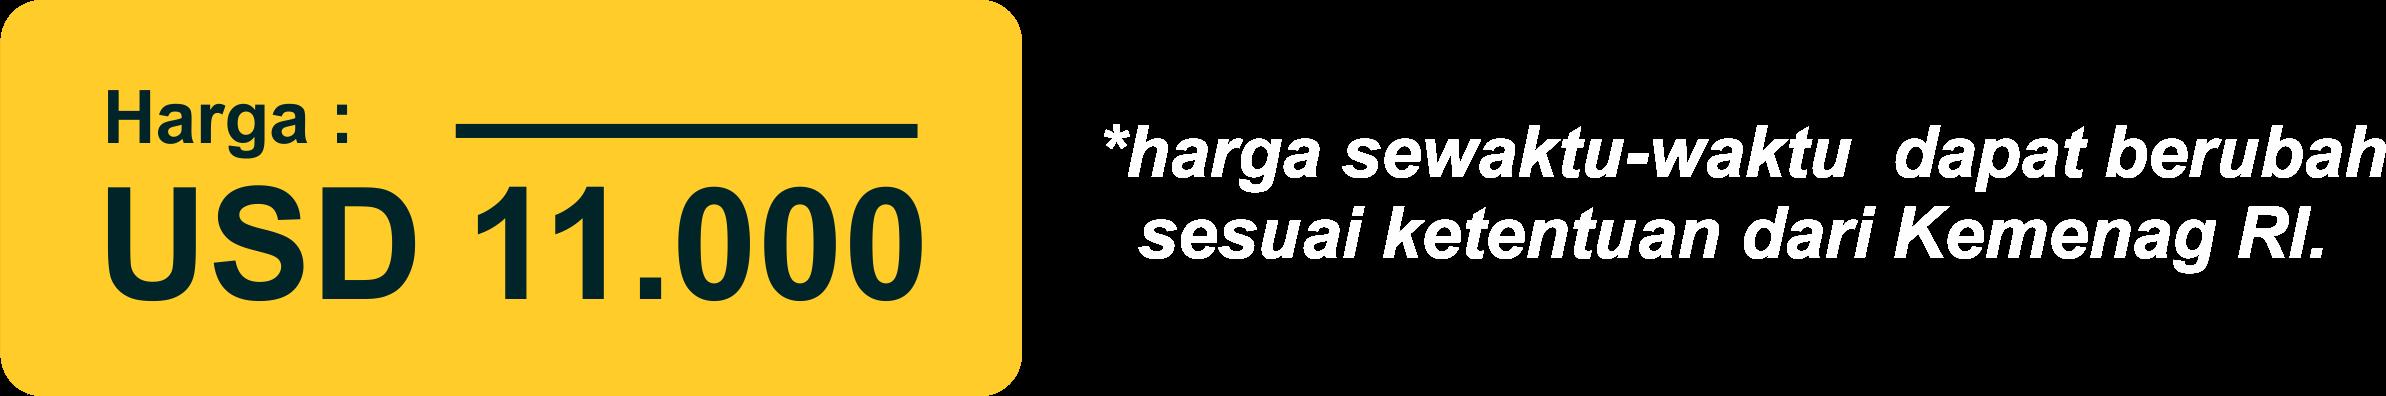 Haji-umroh